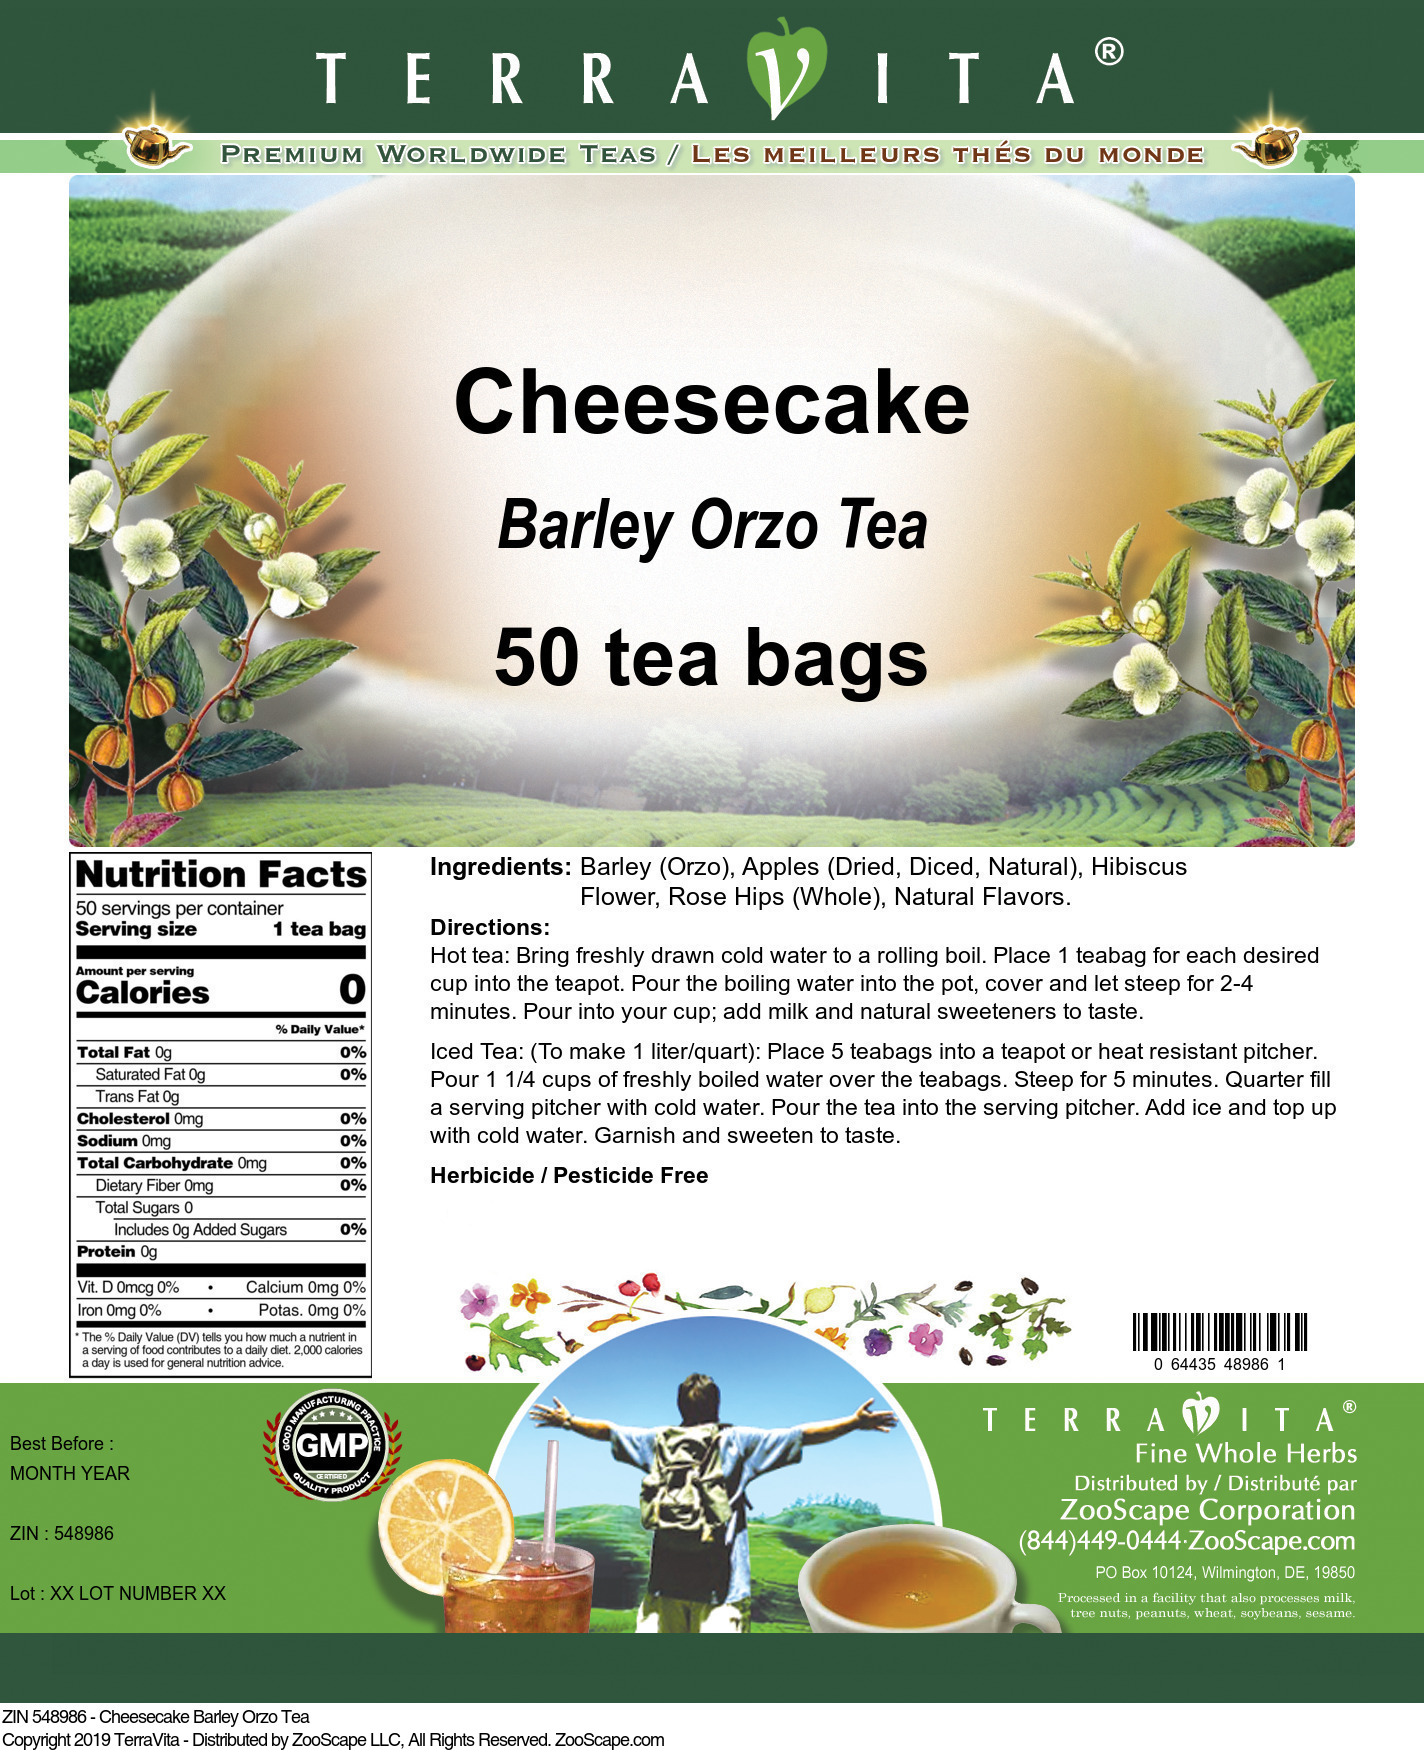 Cheesecake Barley Orzo Tea